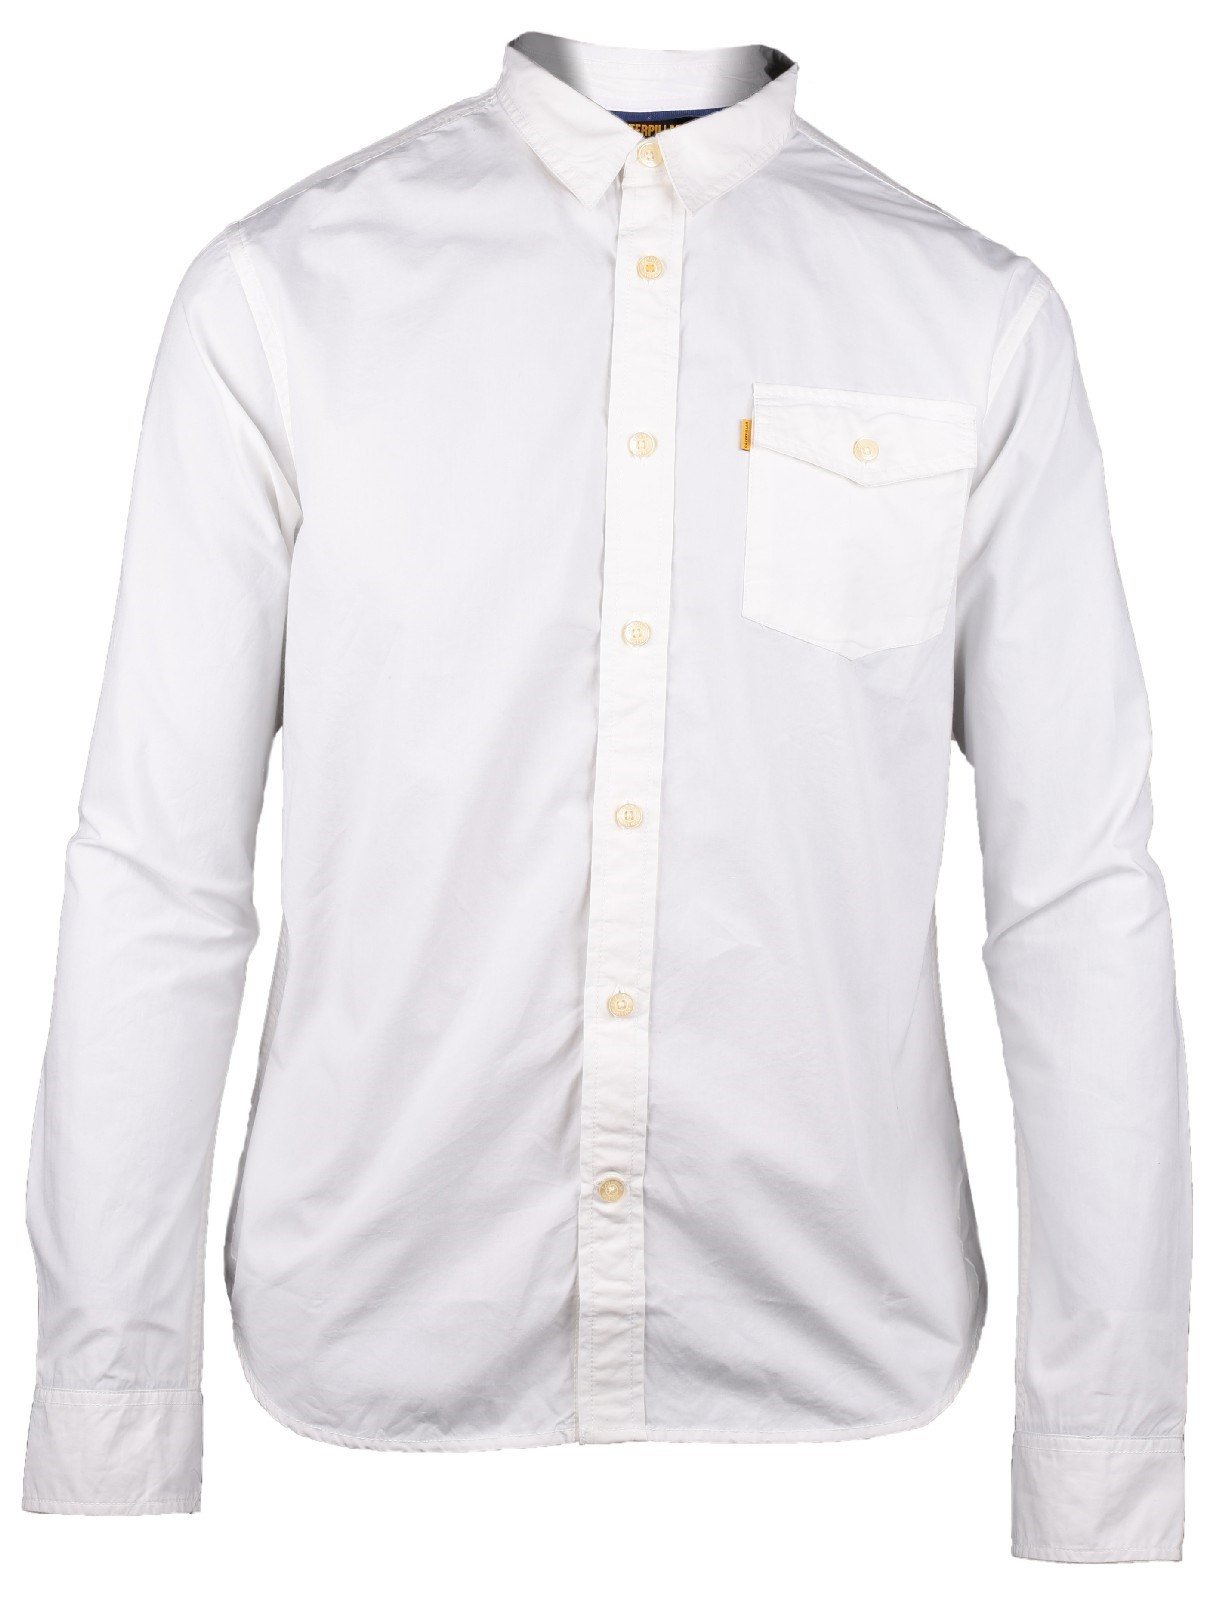 CAT Lifestyle Men's Exchange LS Shirt White 22897 - White Xsl